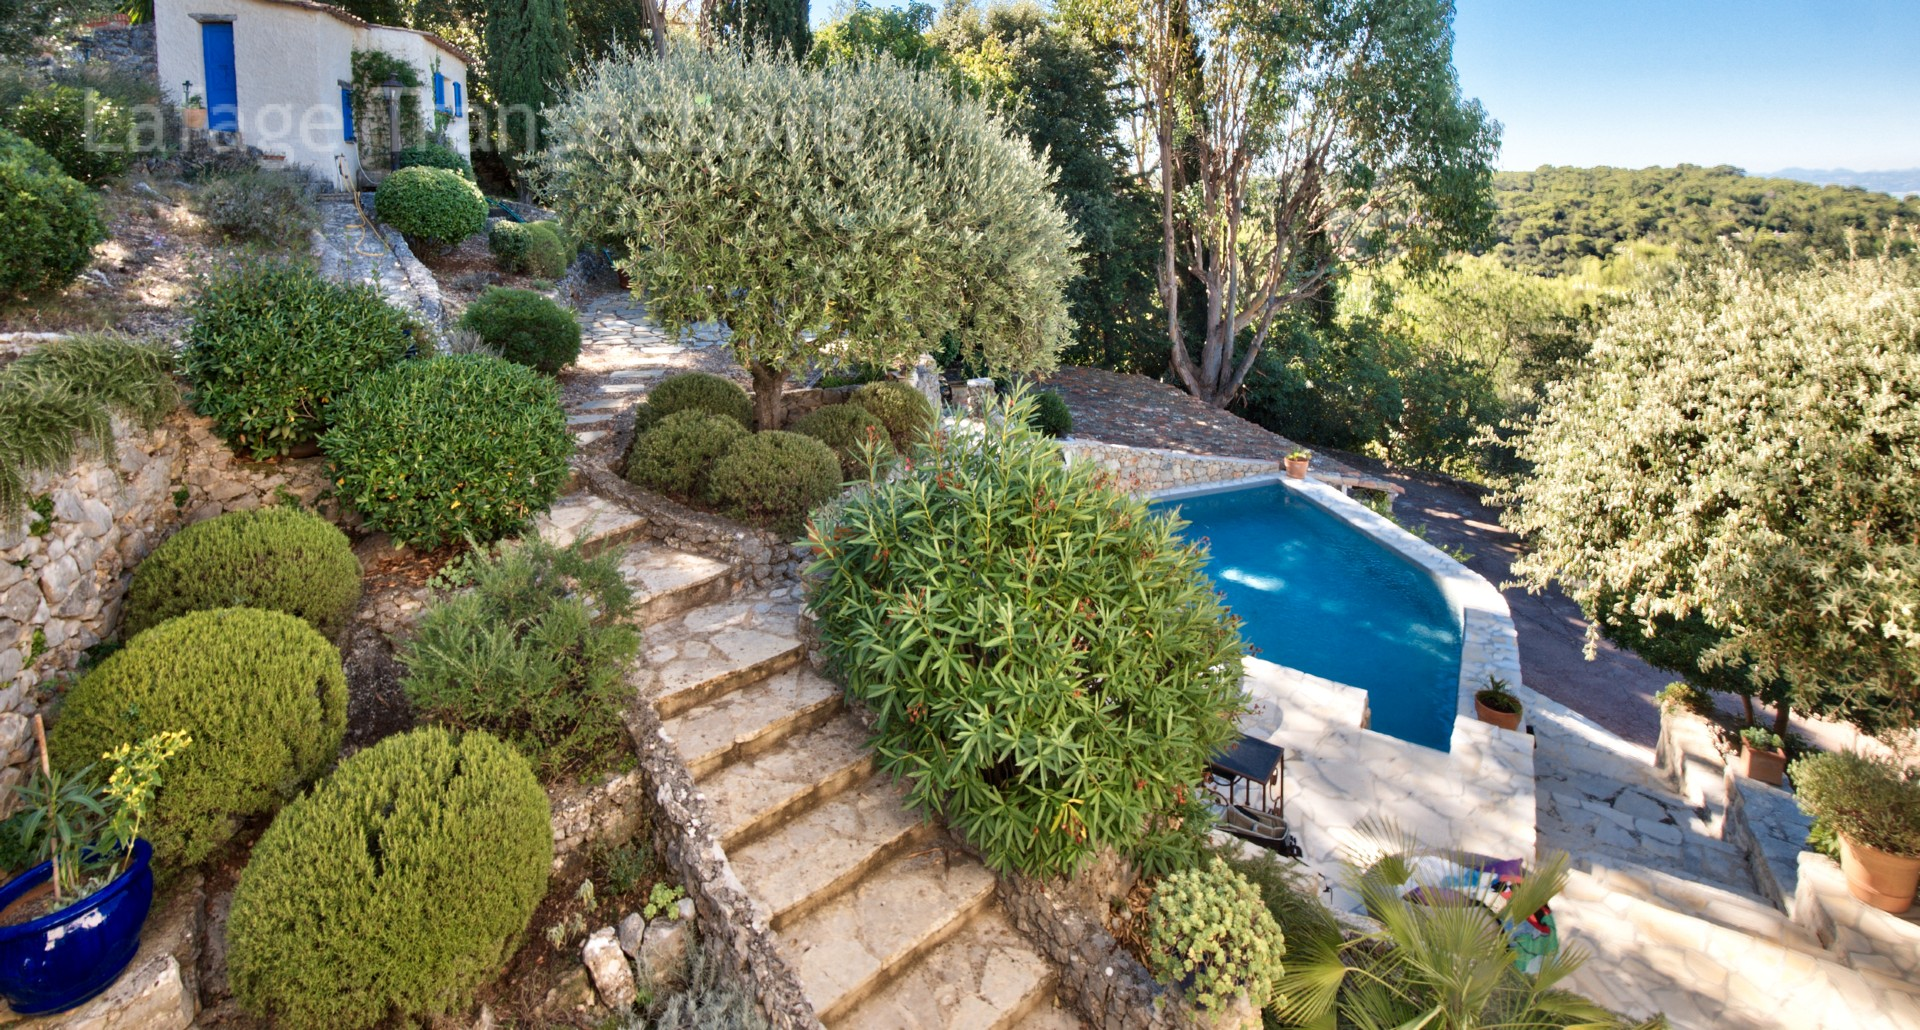 Nice grande corniche villa a vendre de 230 m2 vue panoramique terrain de 3655 m2 piscine - Piscine pente terrain nice ...